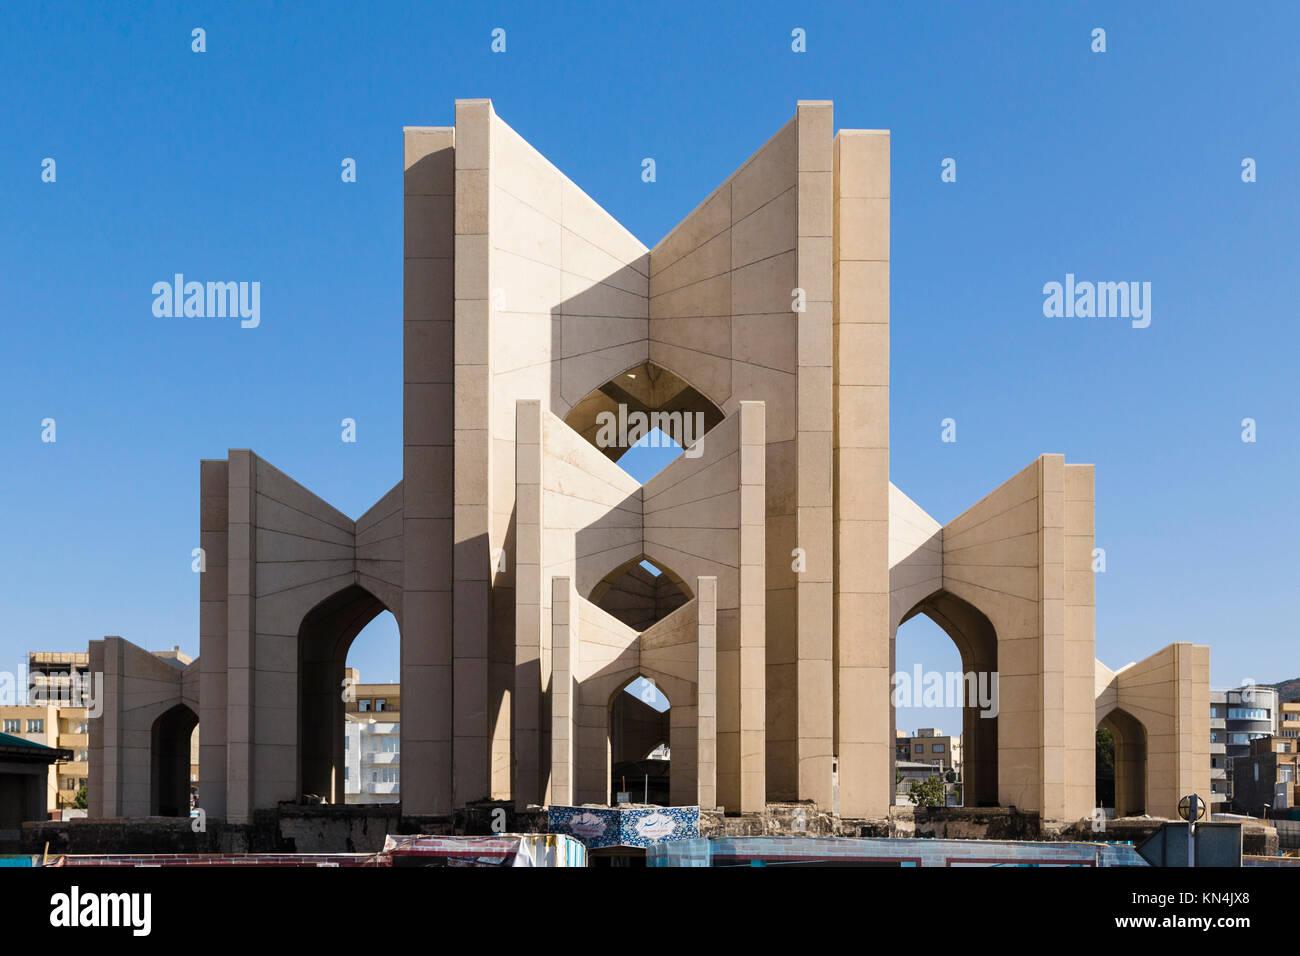 Poet's Mausoleum, Tabriz, Iran - Stock Image